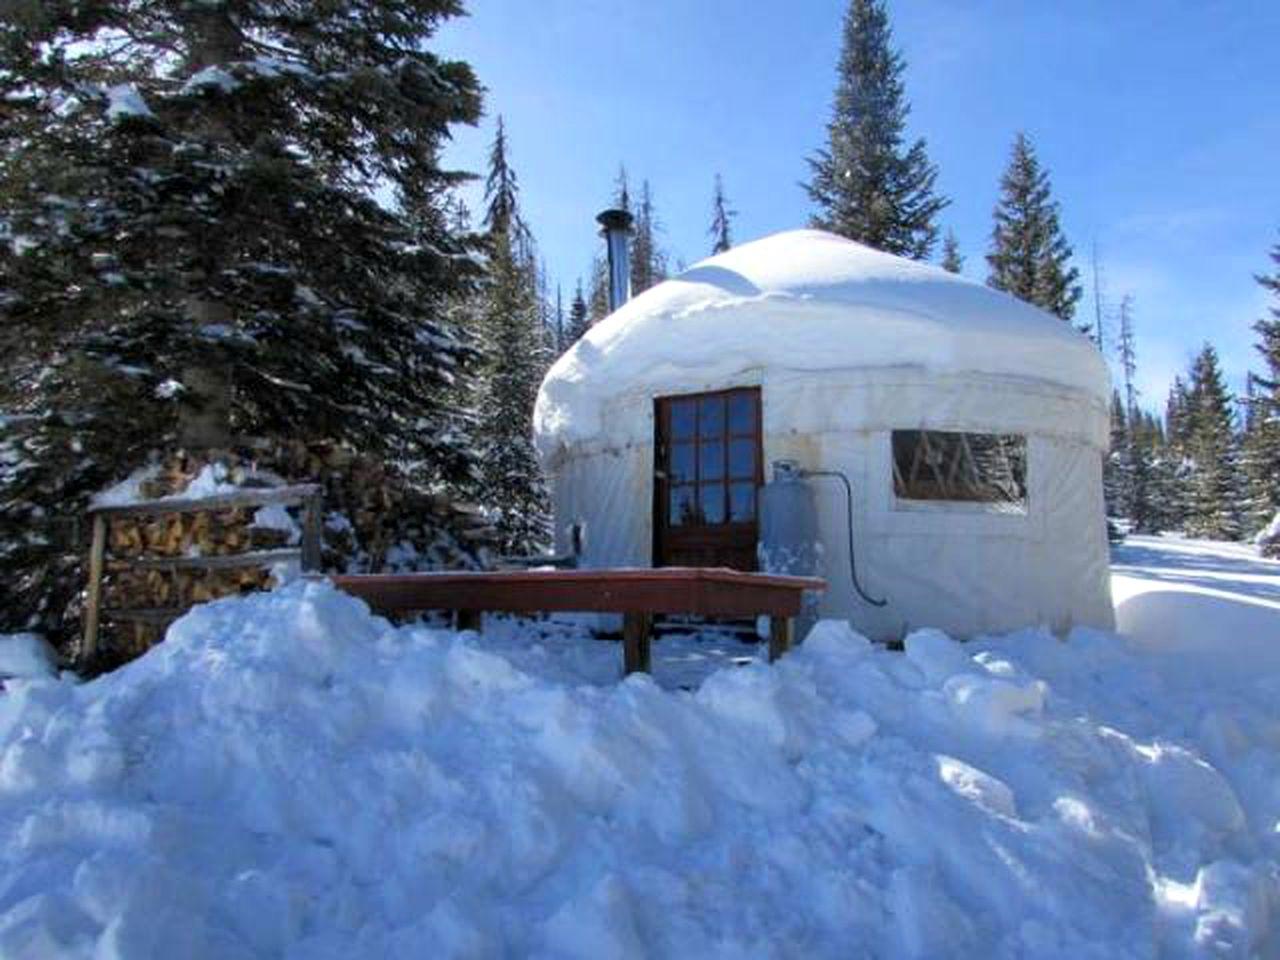 Ski Rental Near Trujillo Meadows Colorado Stay in this unparalleled colorado yurt for a night of pure magic. modern ski yurt rental near the trujillo meadows reservoir in colorado